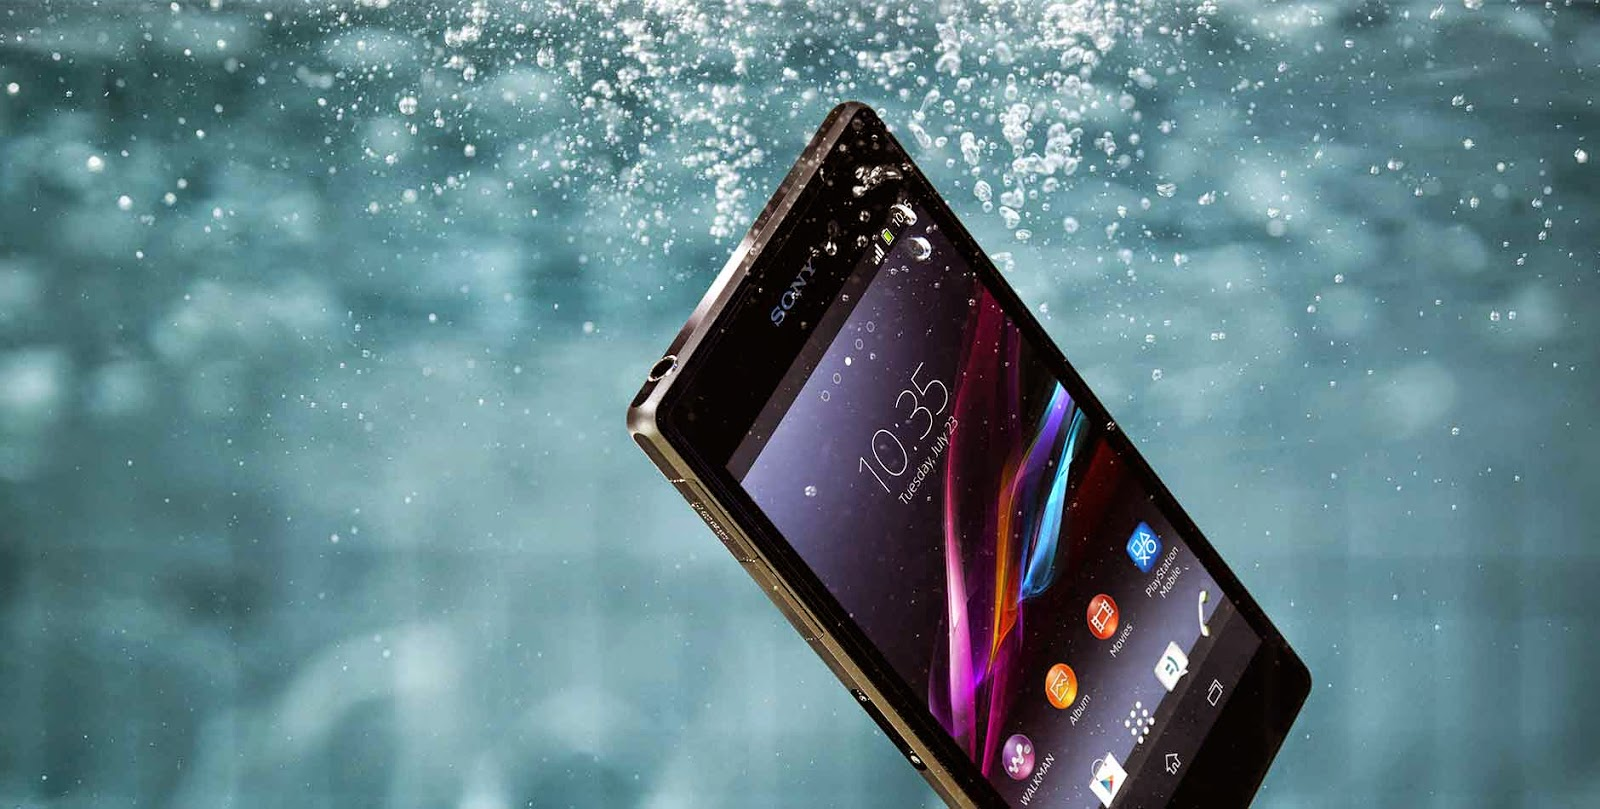 Spesifikasi Sony Xperia Z1 Terbaru